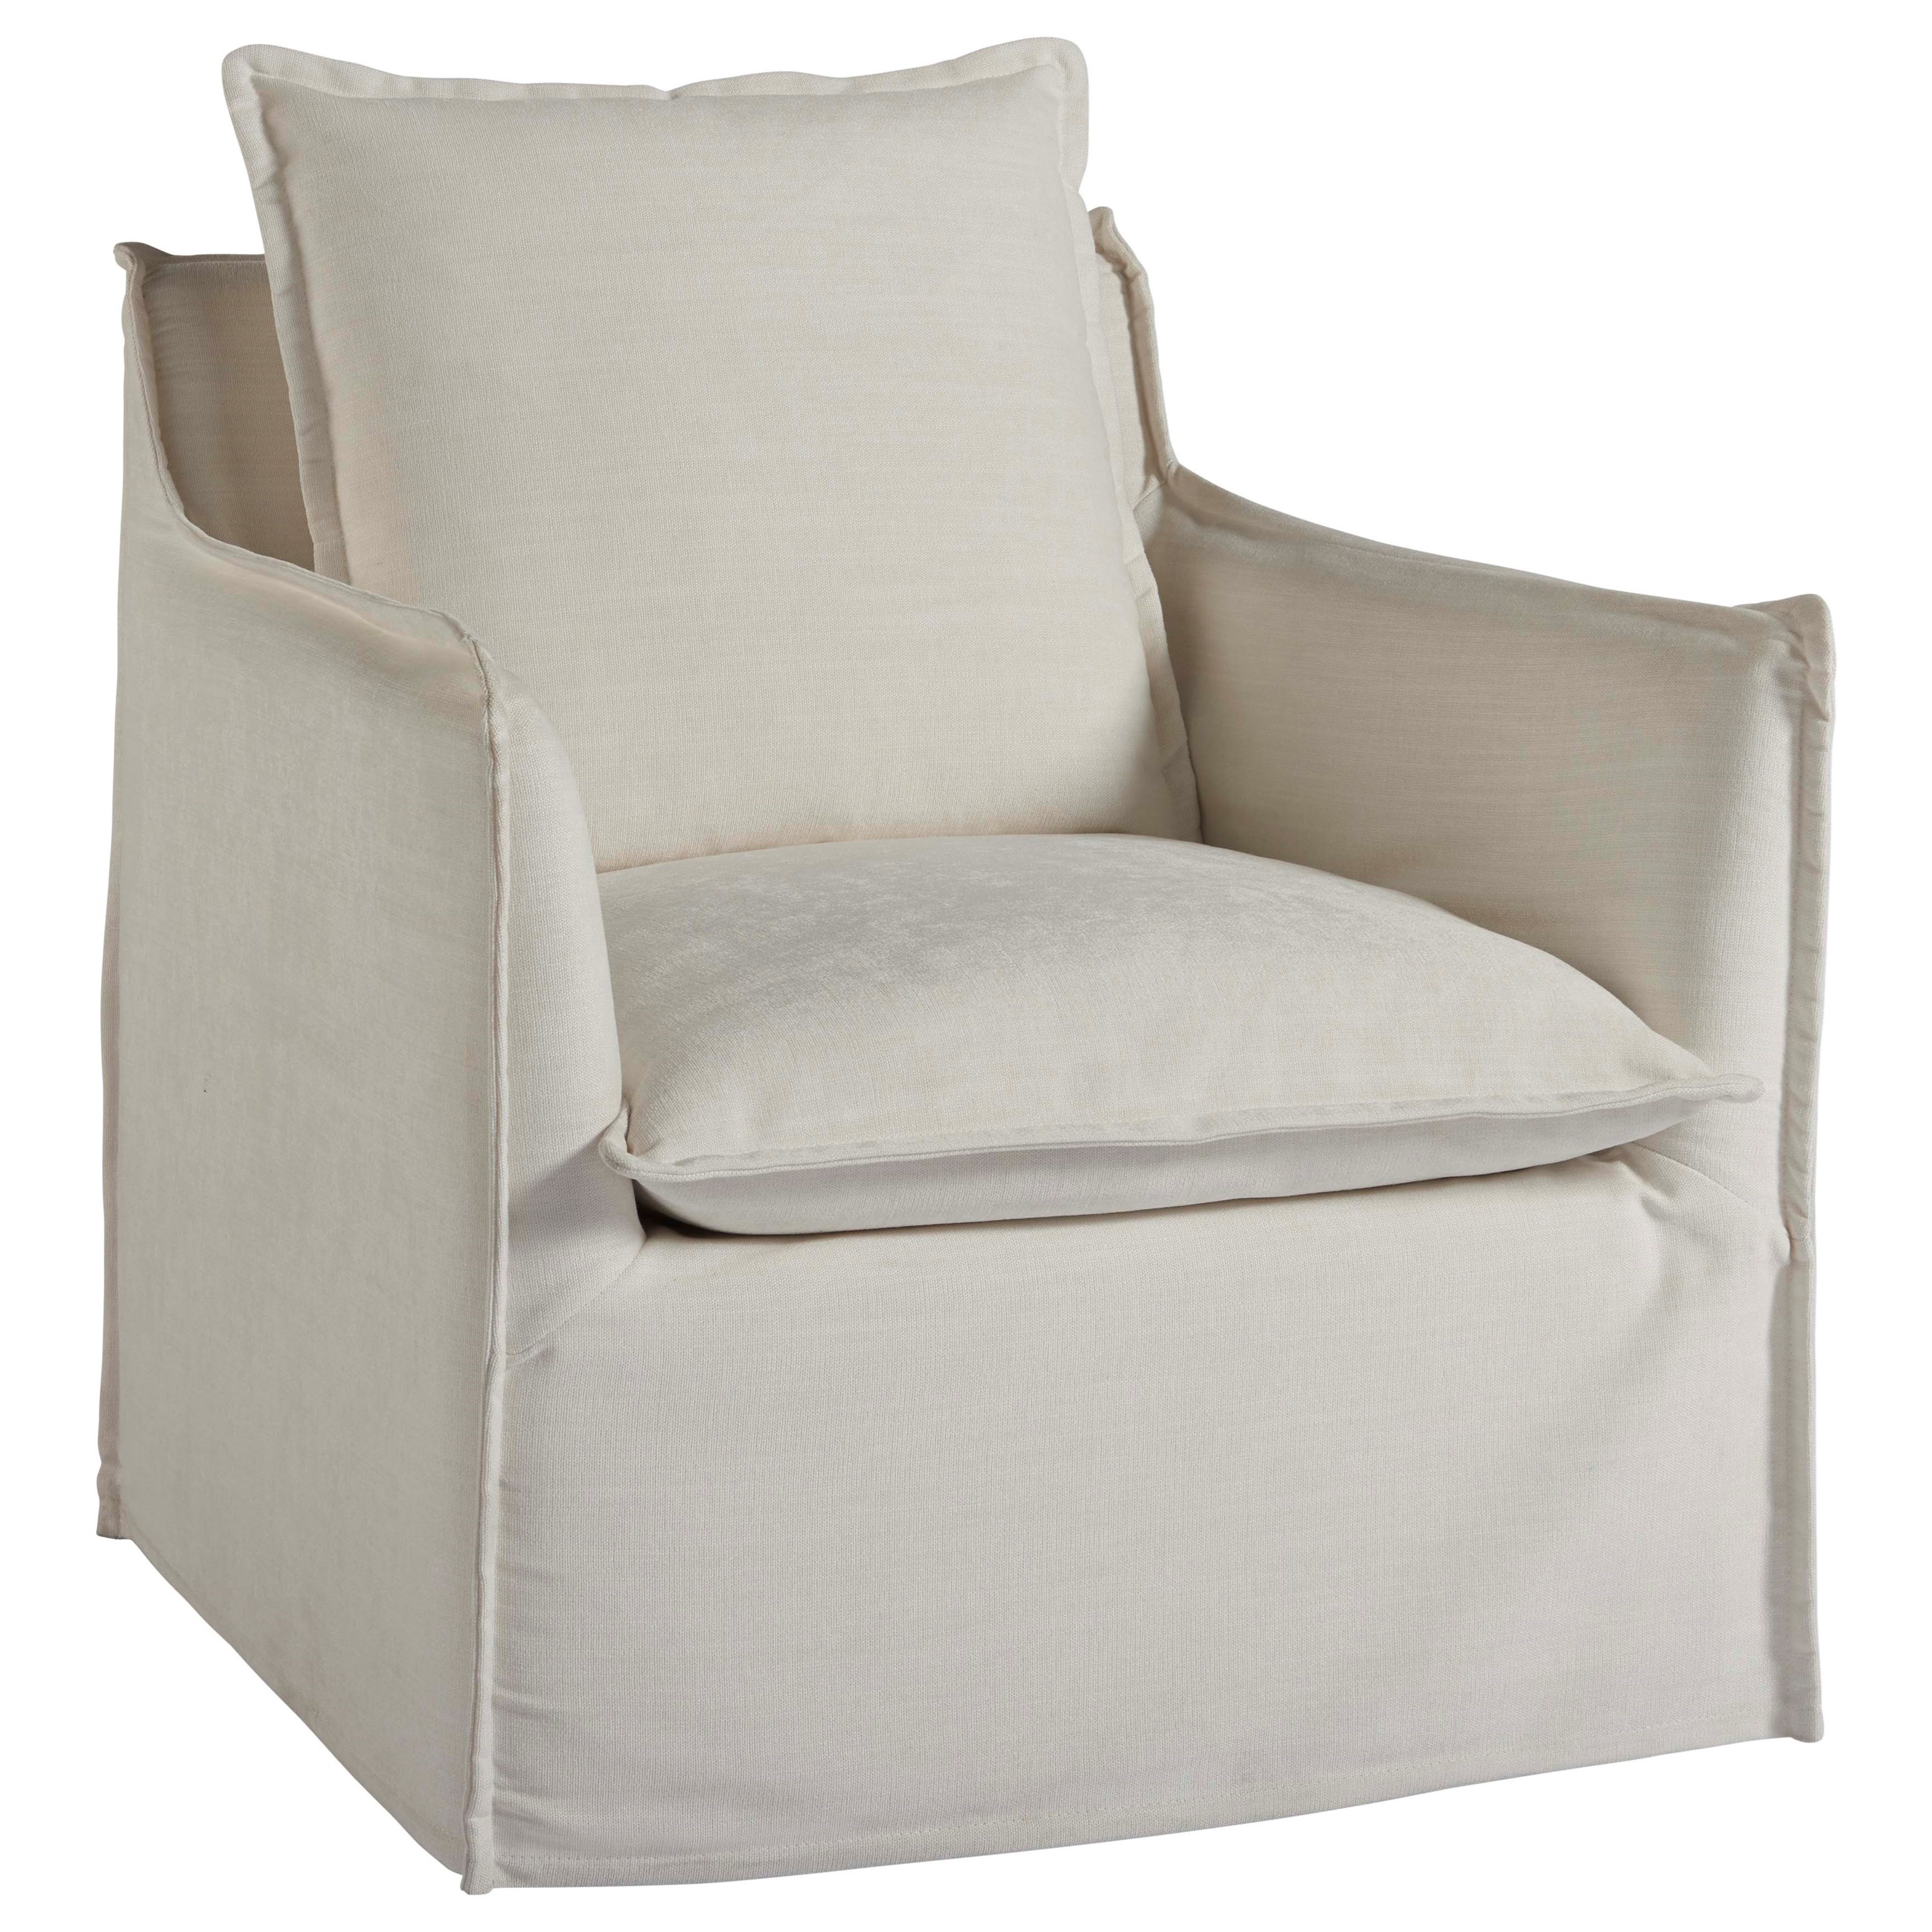 Coastal Living Home - Escape Siesta Key Swivel Chair by Universal at Baer's Furniture